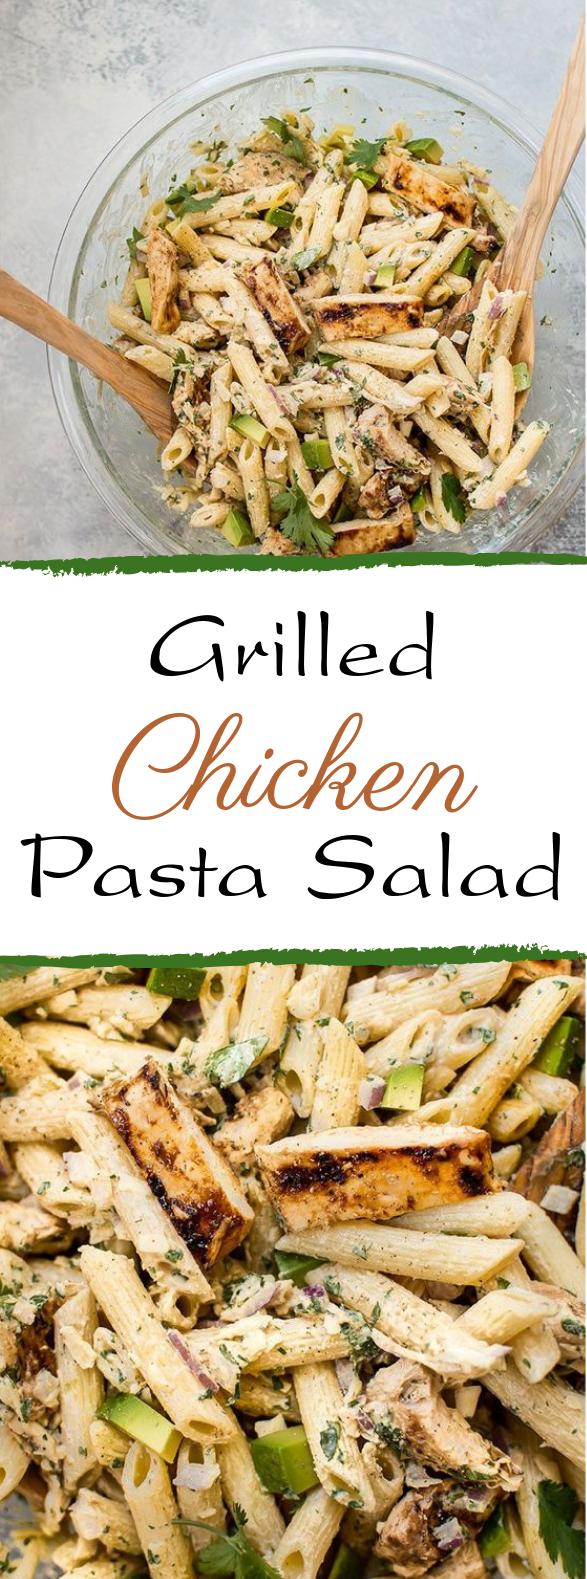 Grilled Chicken Pasta Salad #summerrecipe #salad